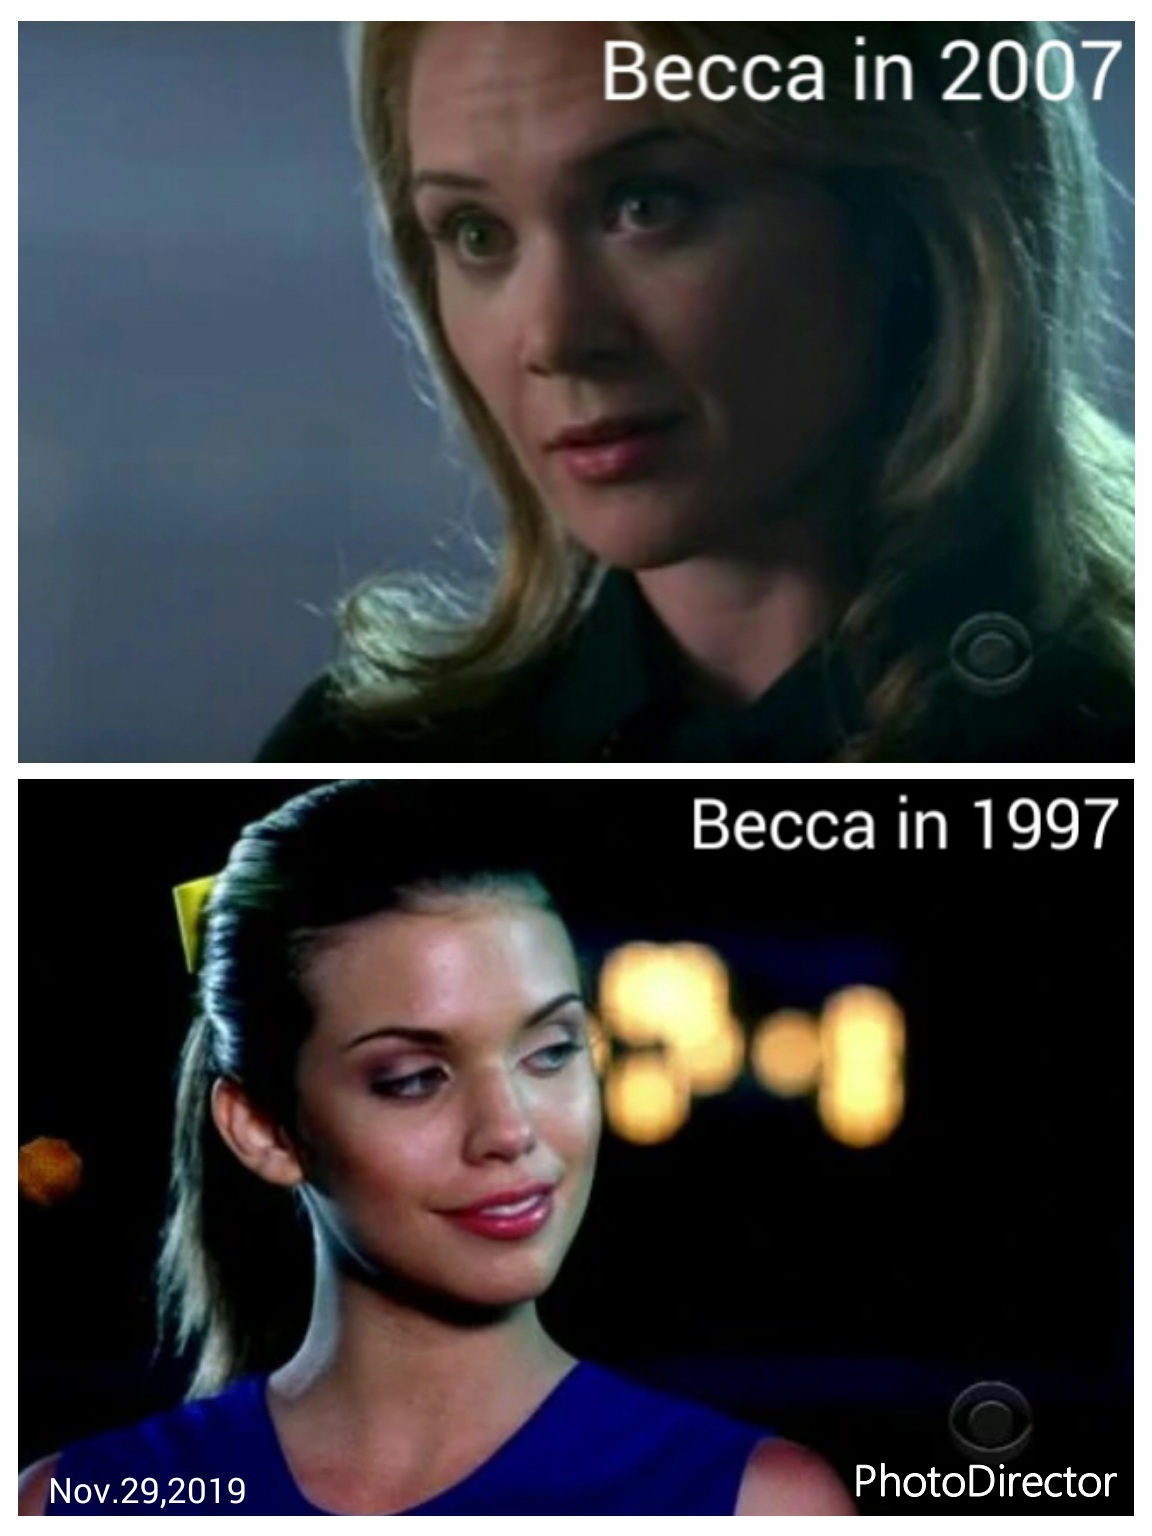 Becca Abrams